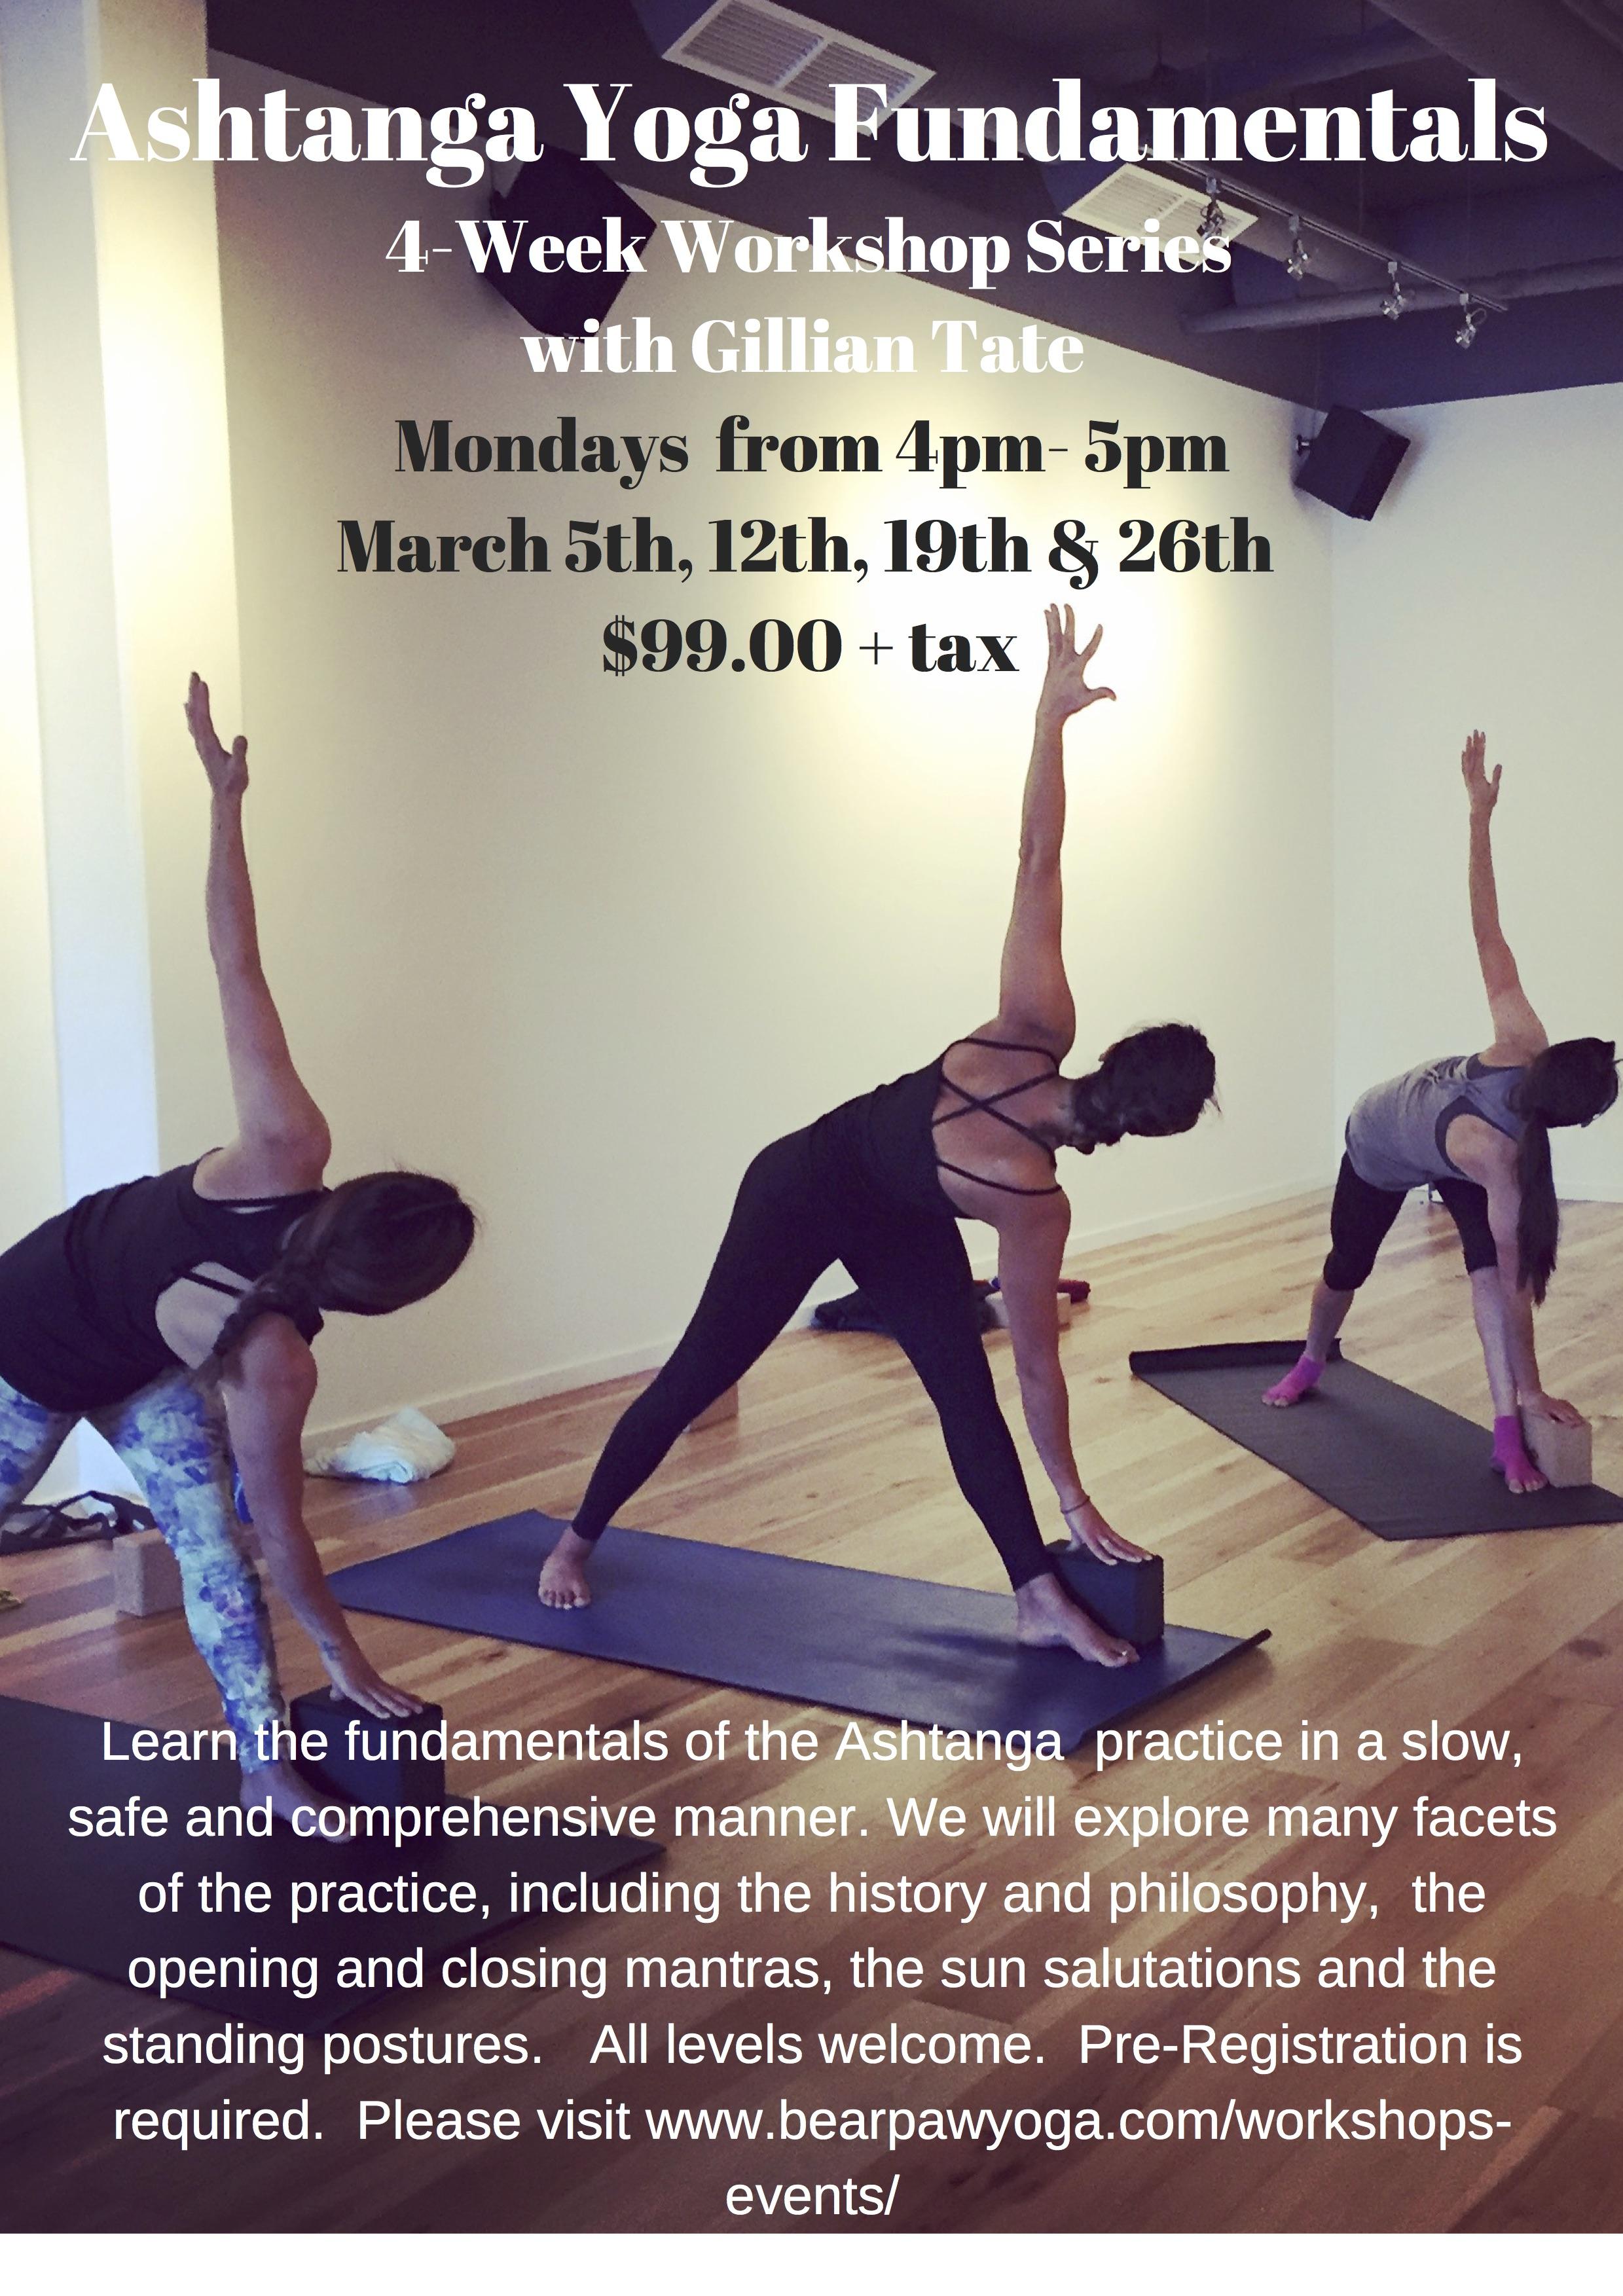 Ashtanga Yoga Fundamentals